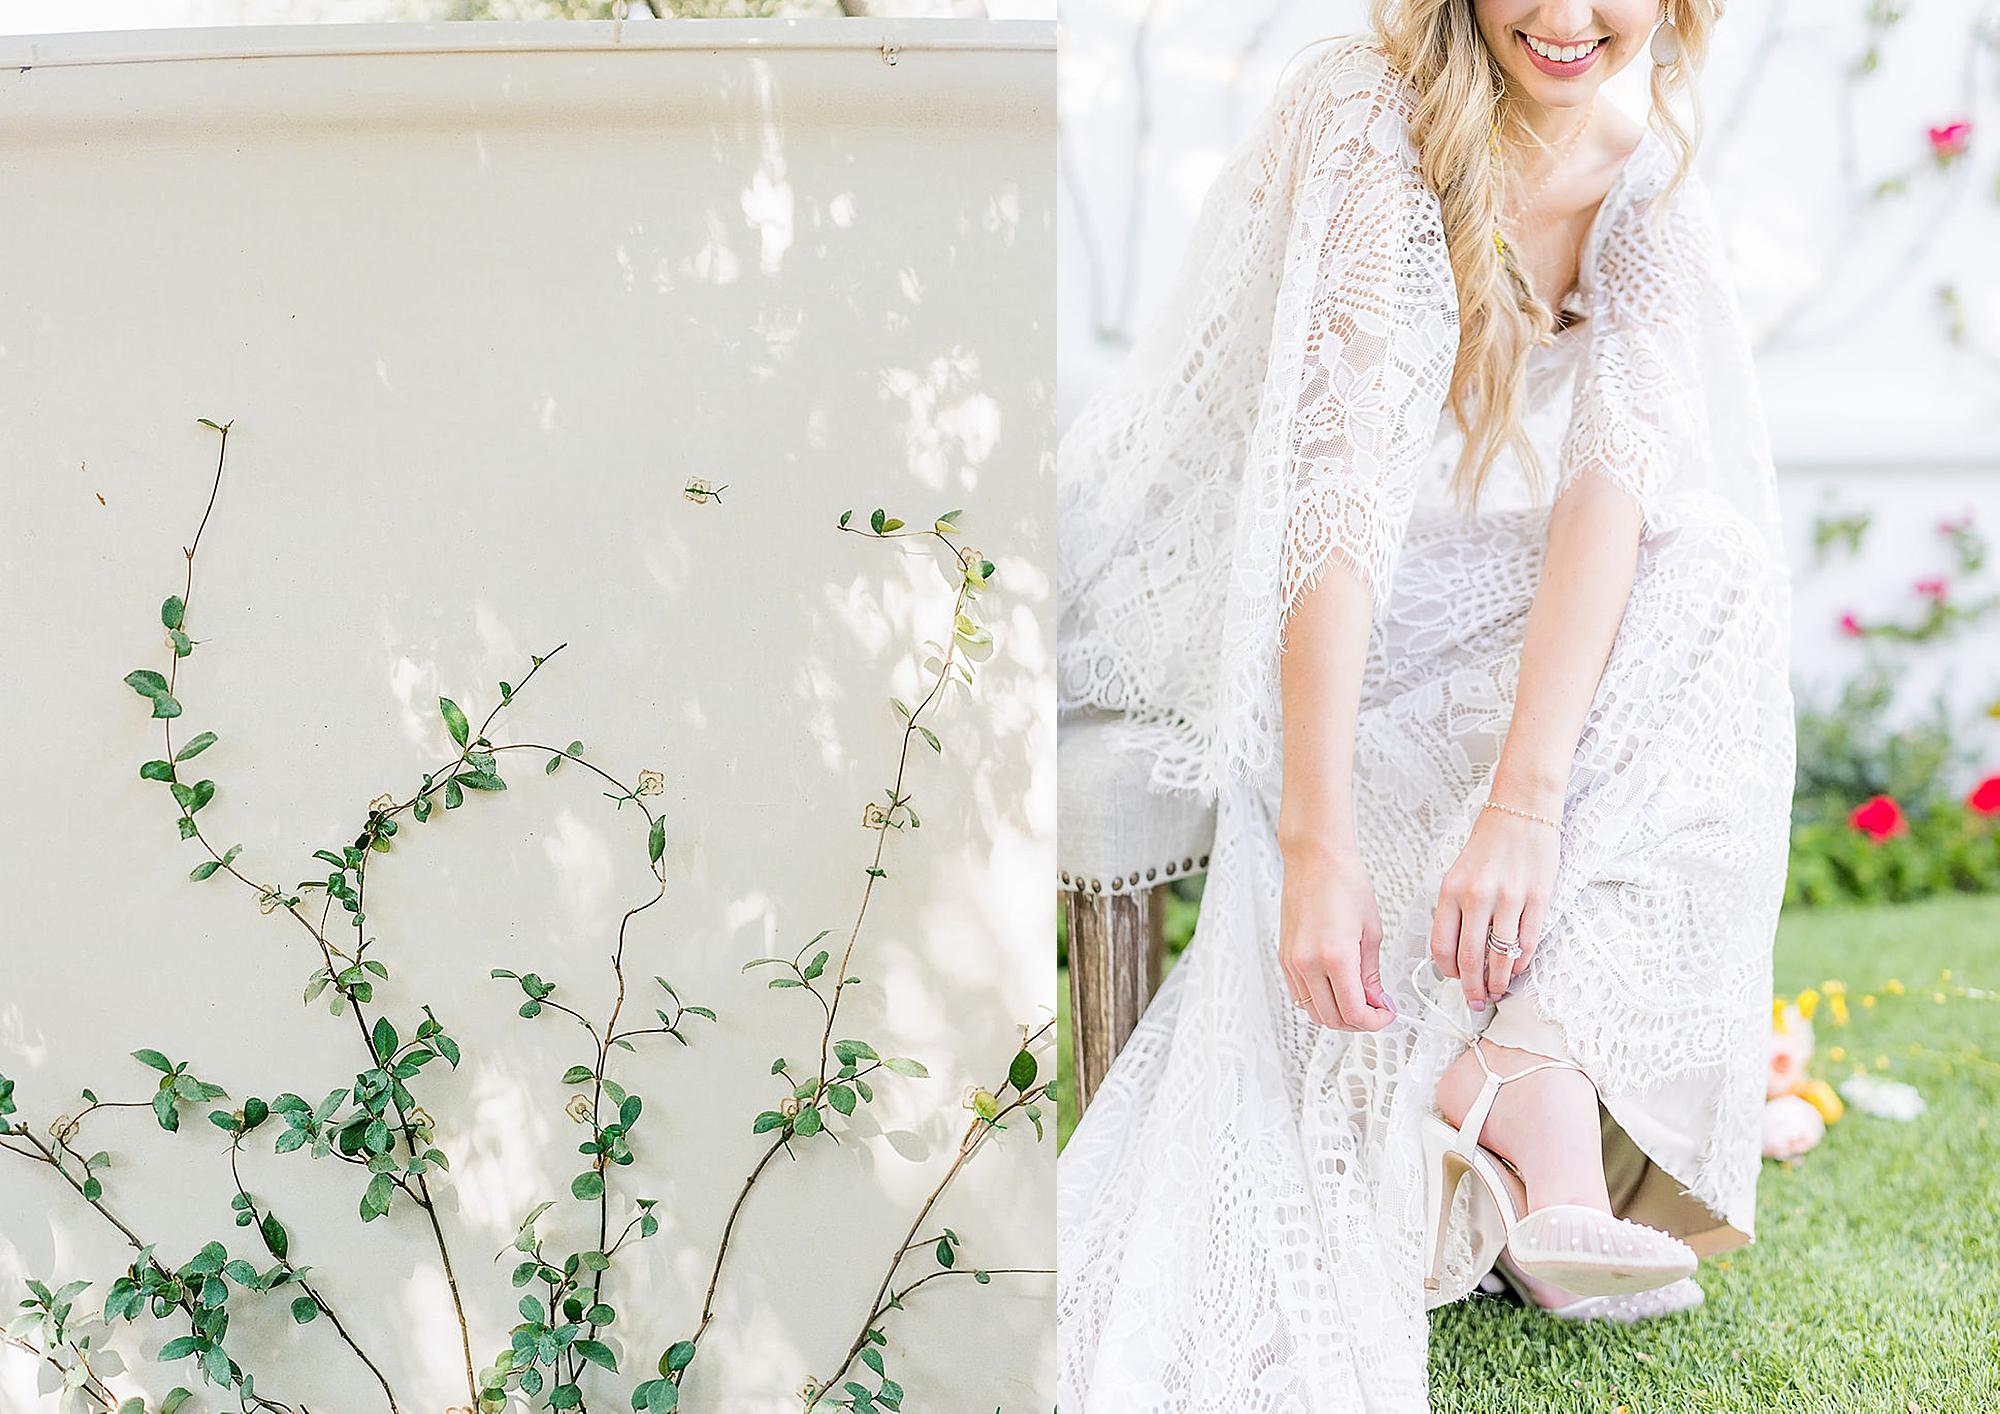 El Chorro Sedona AZ Wedding Photography by Magi Fisher of Magdalena Studios 0004